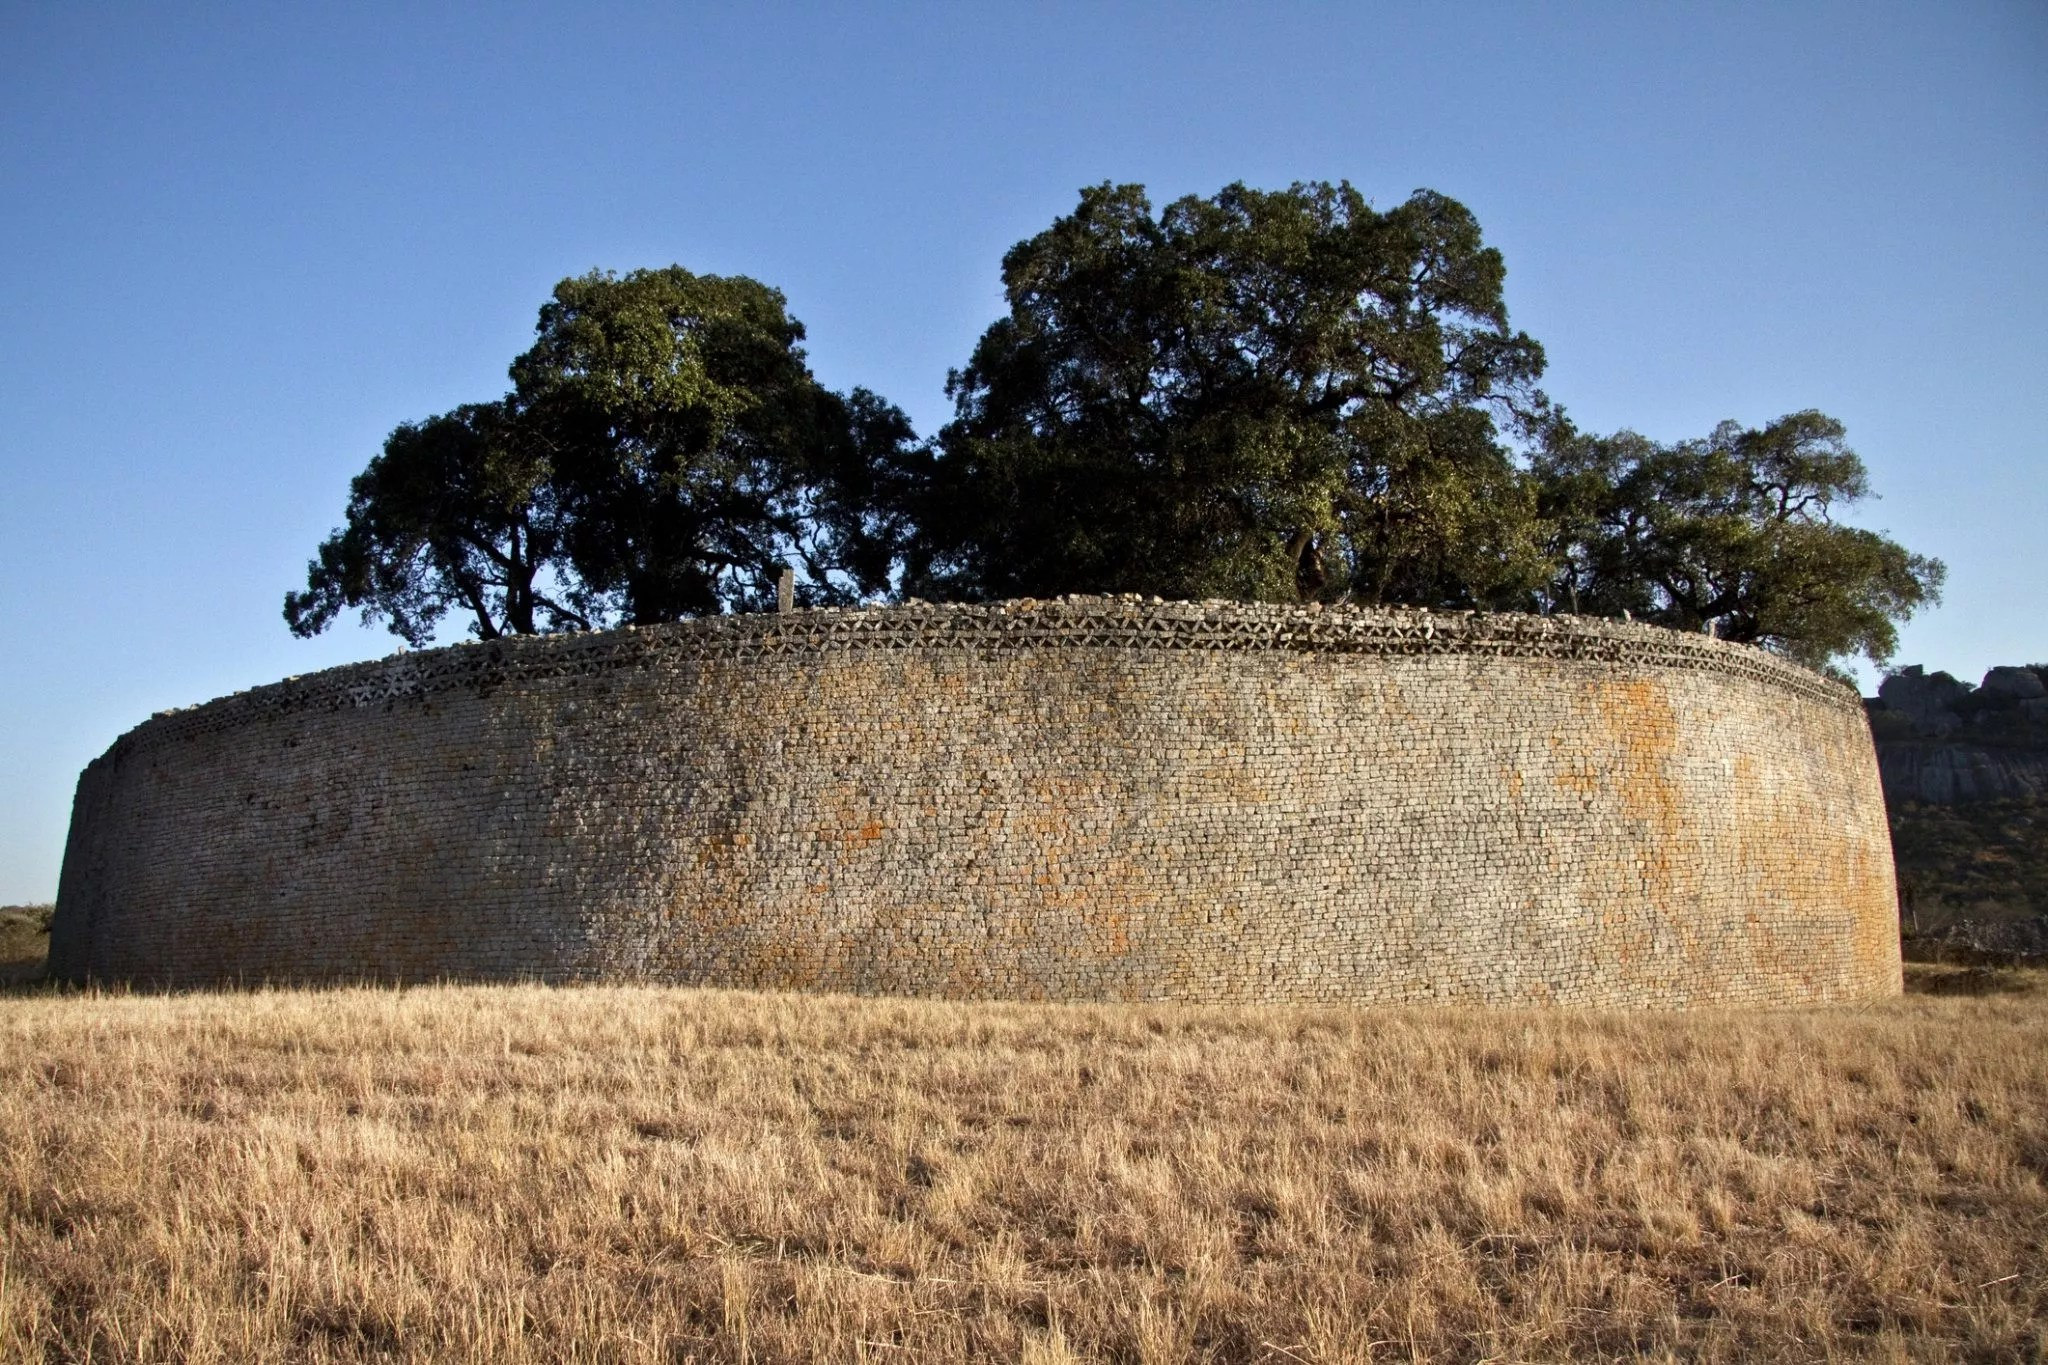 Ancient Great Zimbabwe Culture